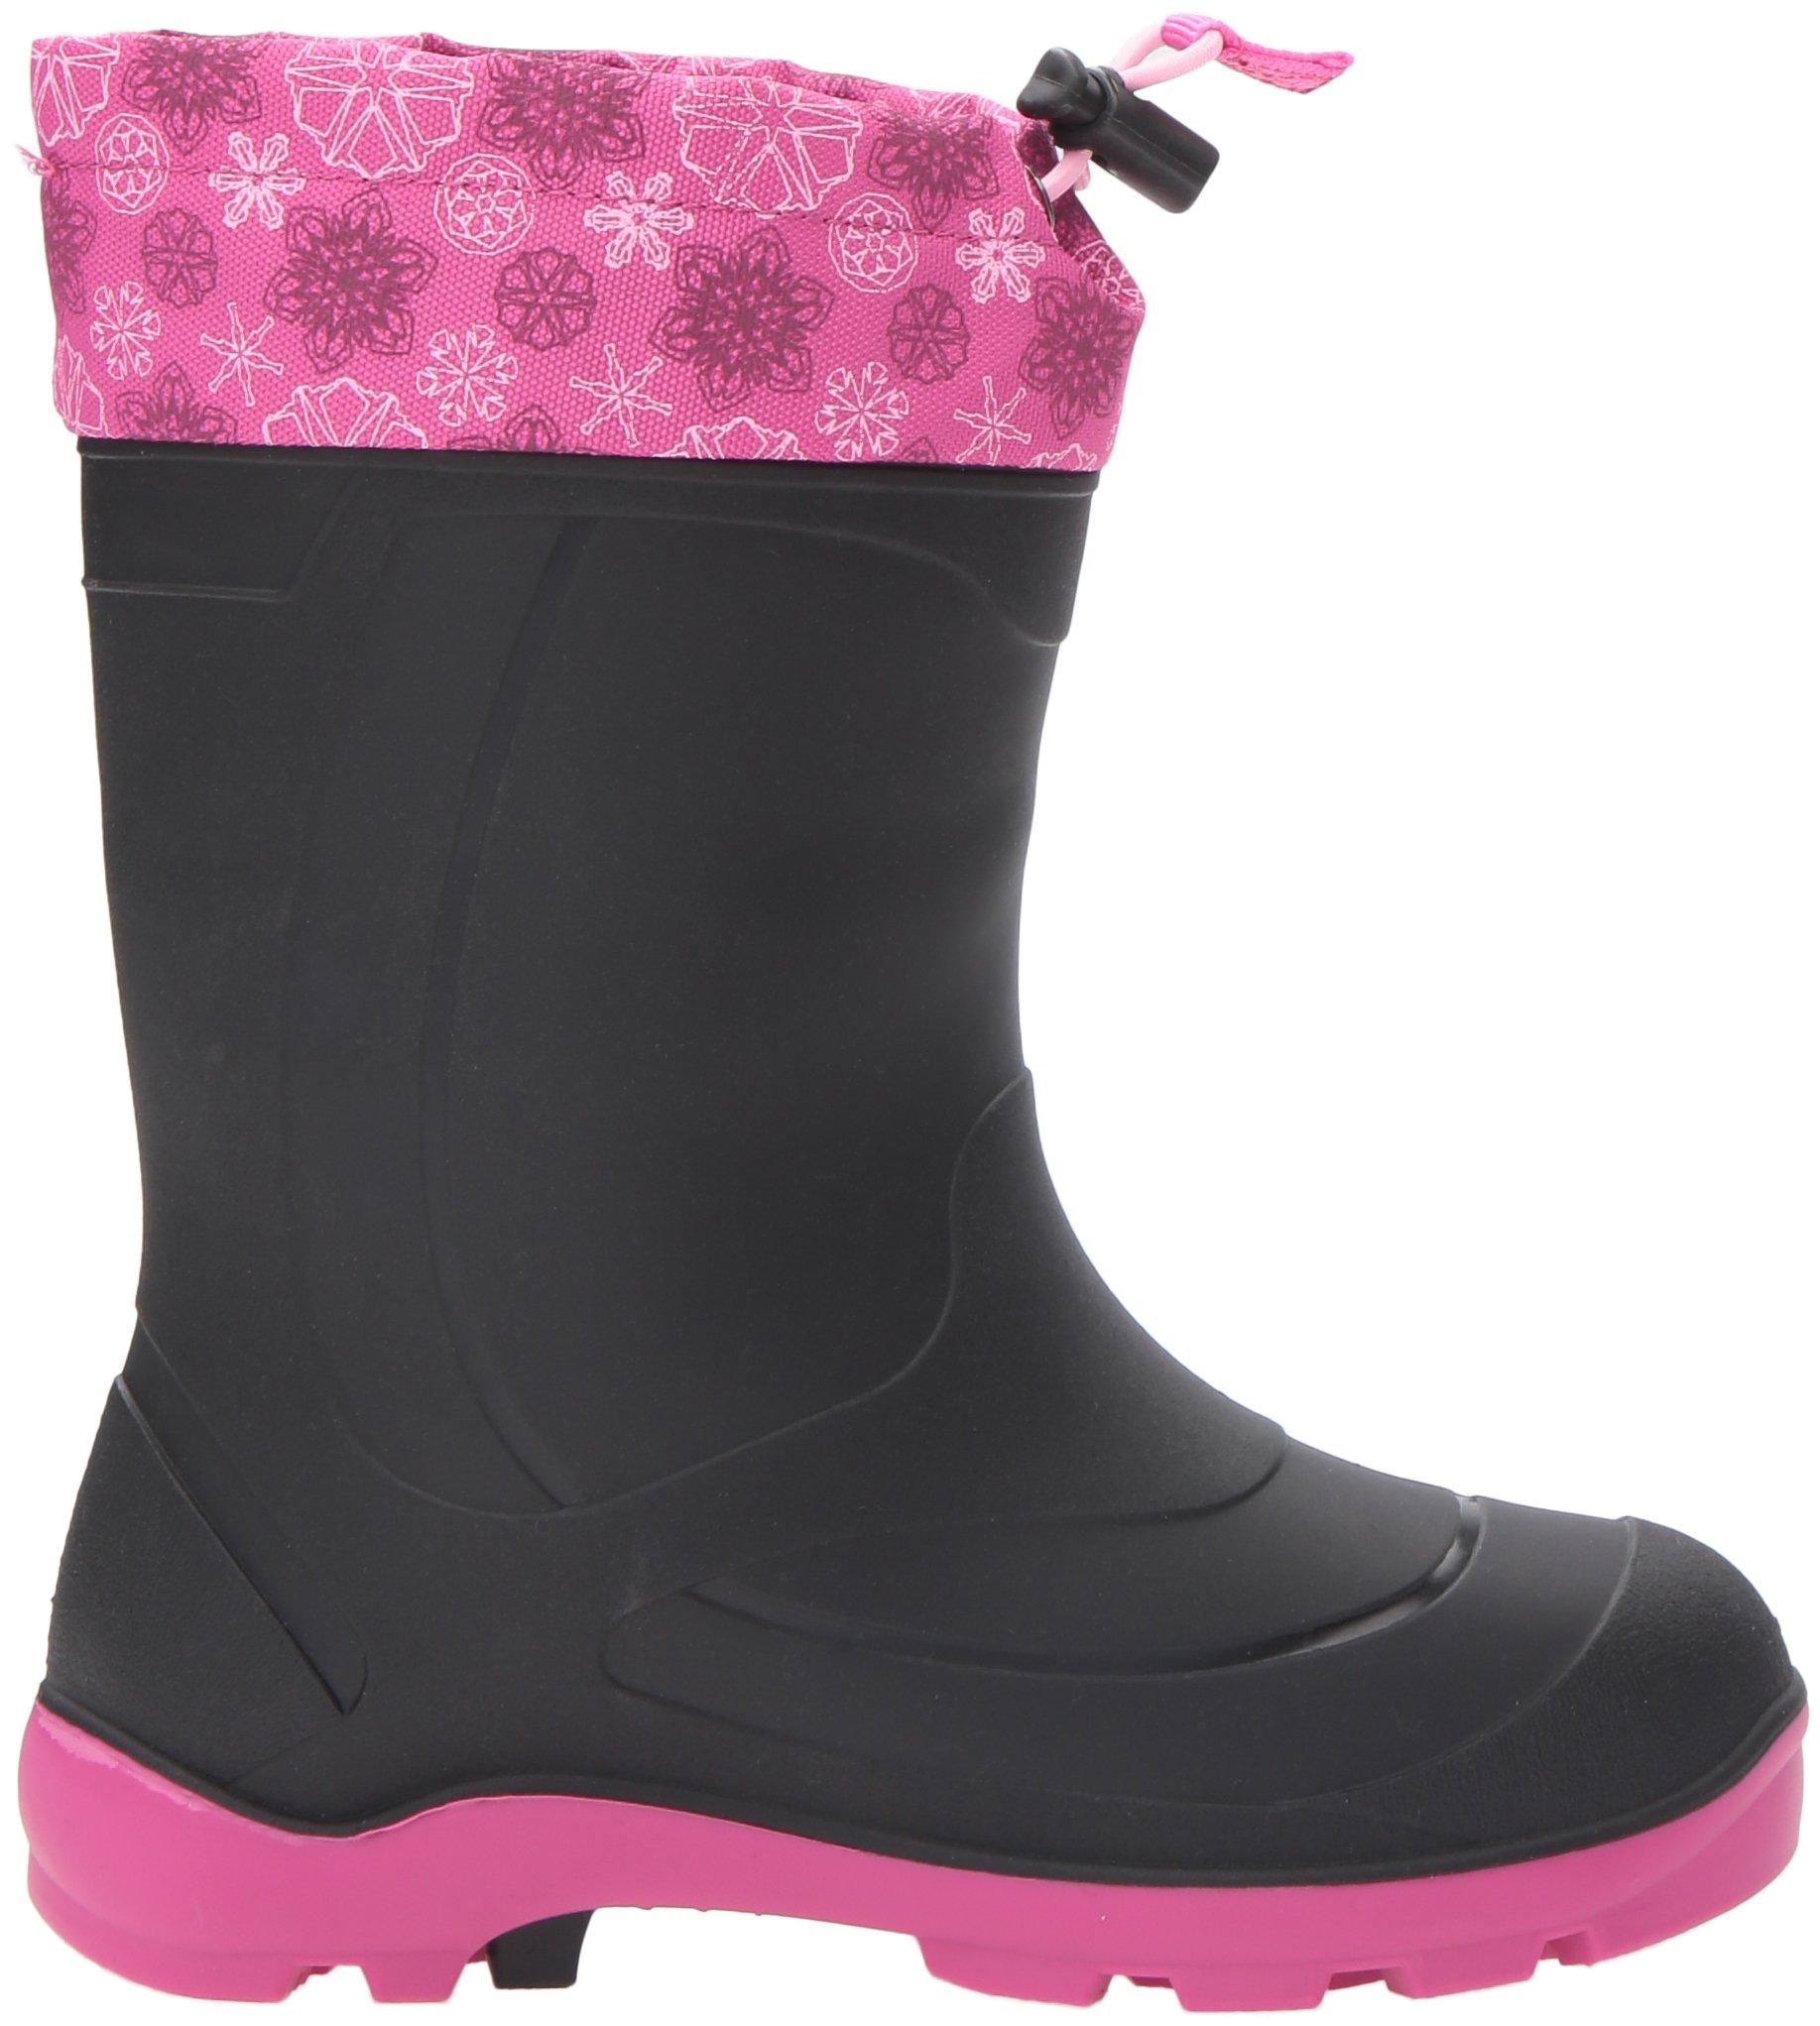 Kamik Kids' Snobuster2 Snow Boot Black/Magenta 9 M US Toddler by Kamik (Image #7)